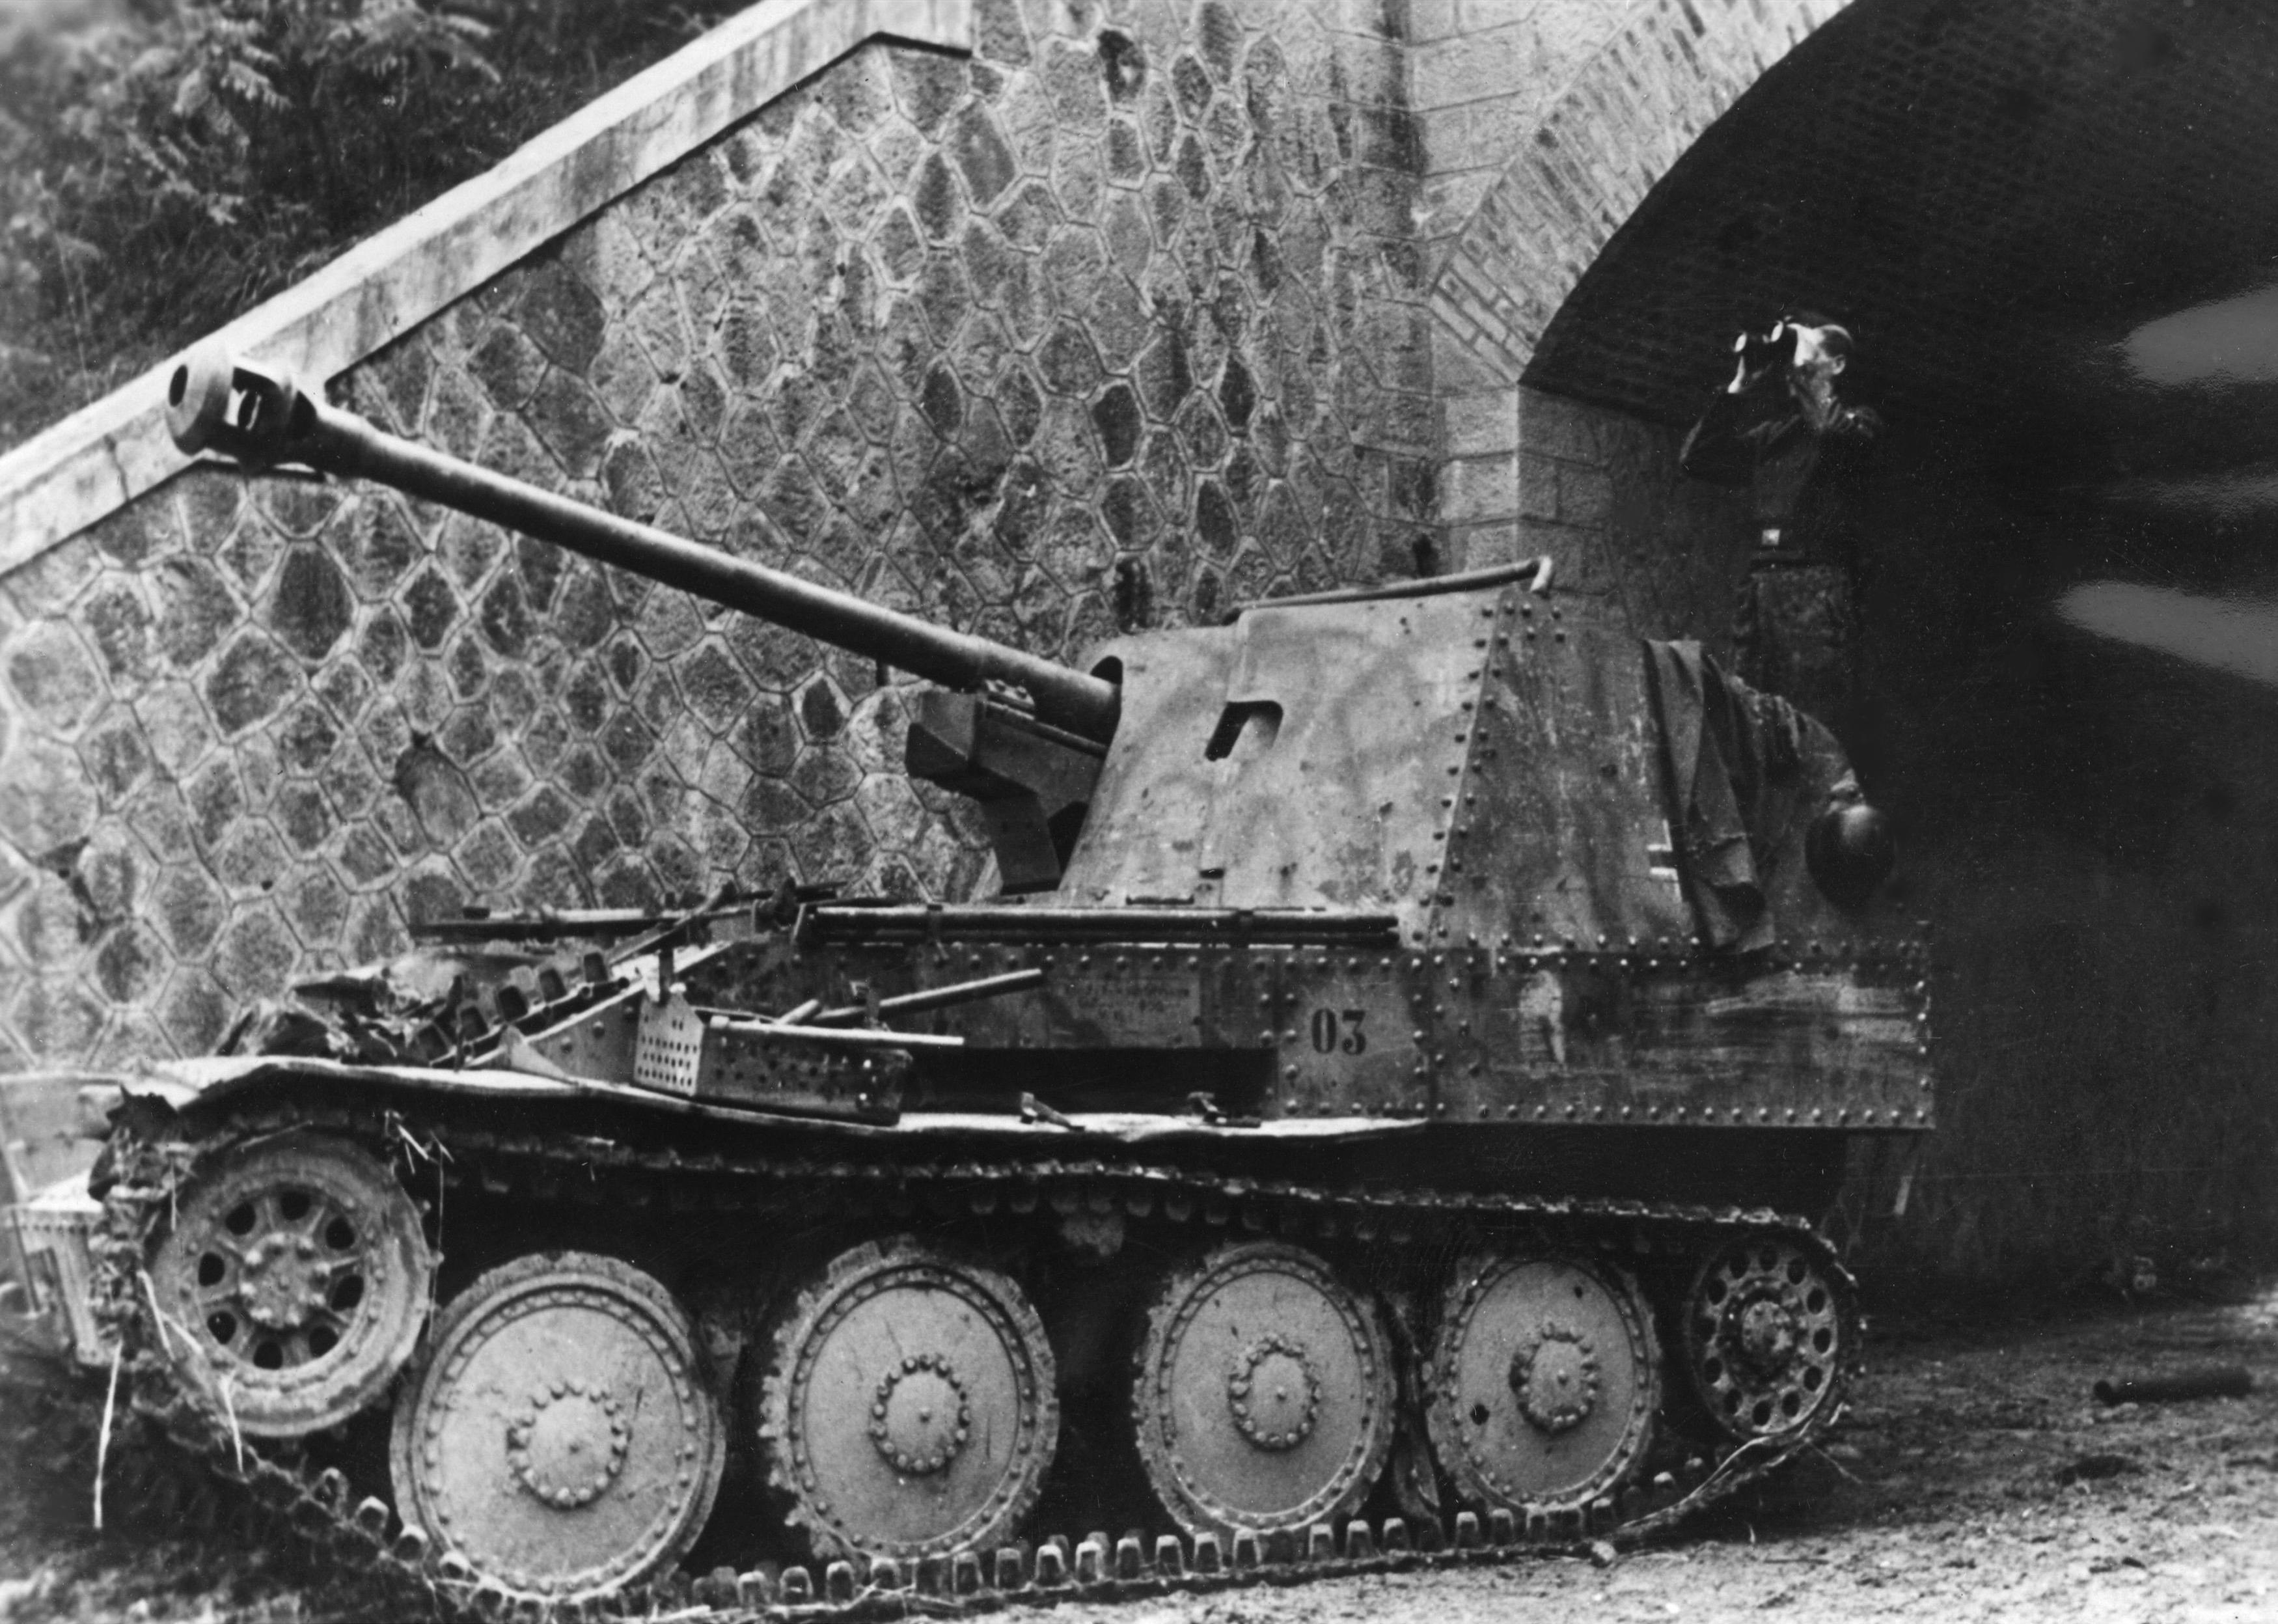 Немецкая противотанковая САУ Marder III Ausf. M на итальянском фронте